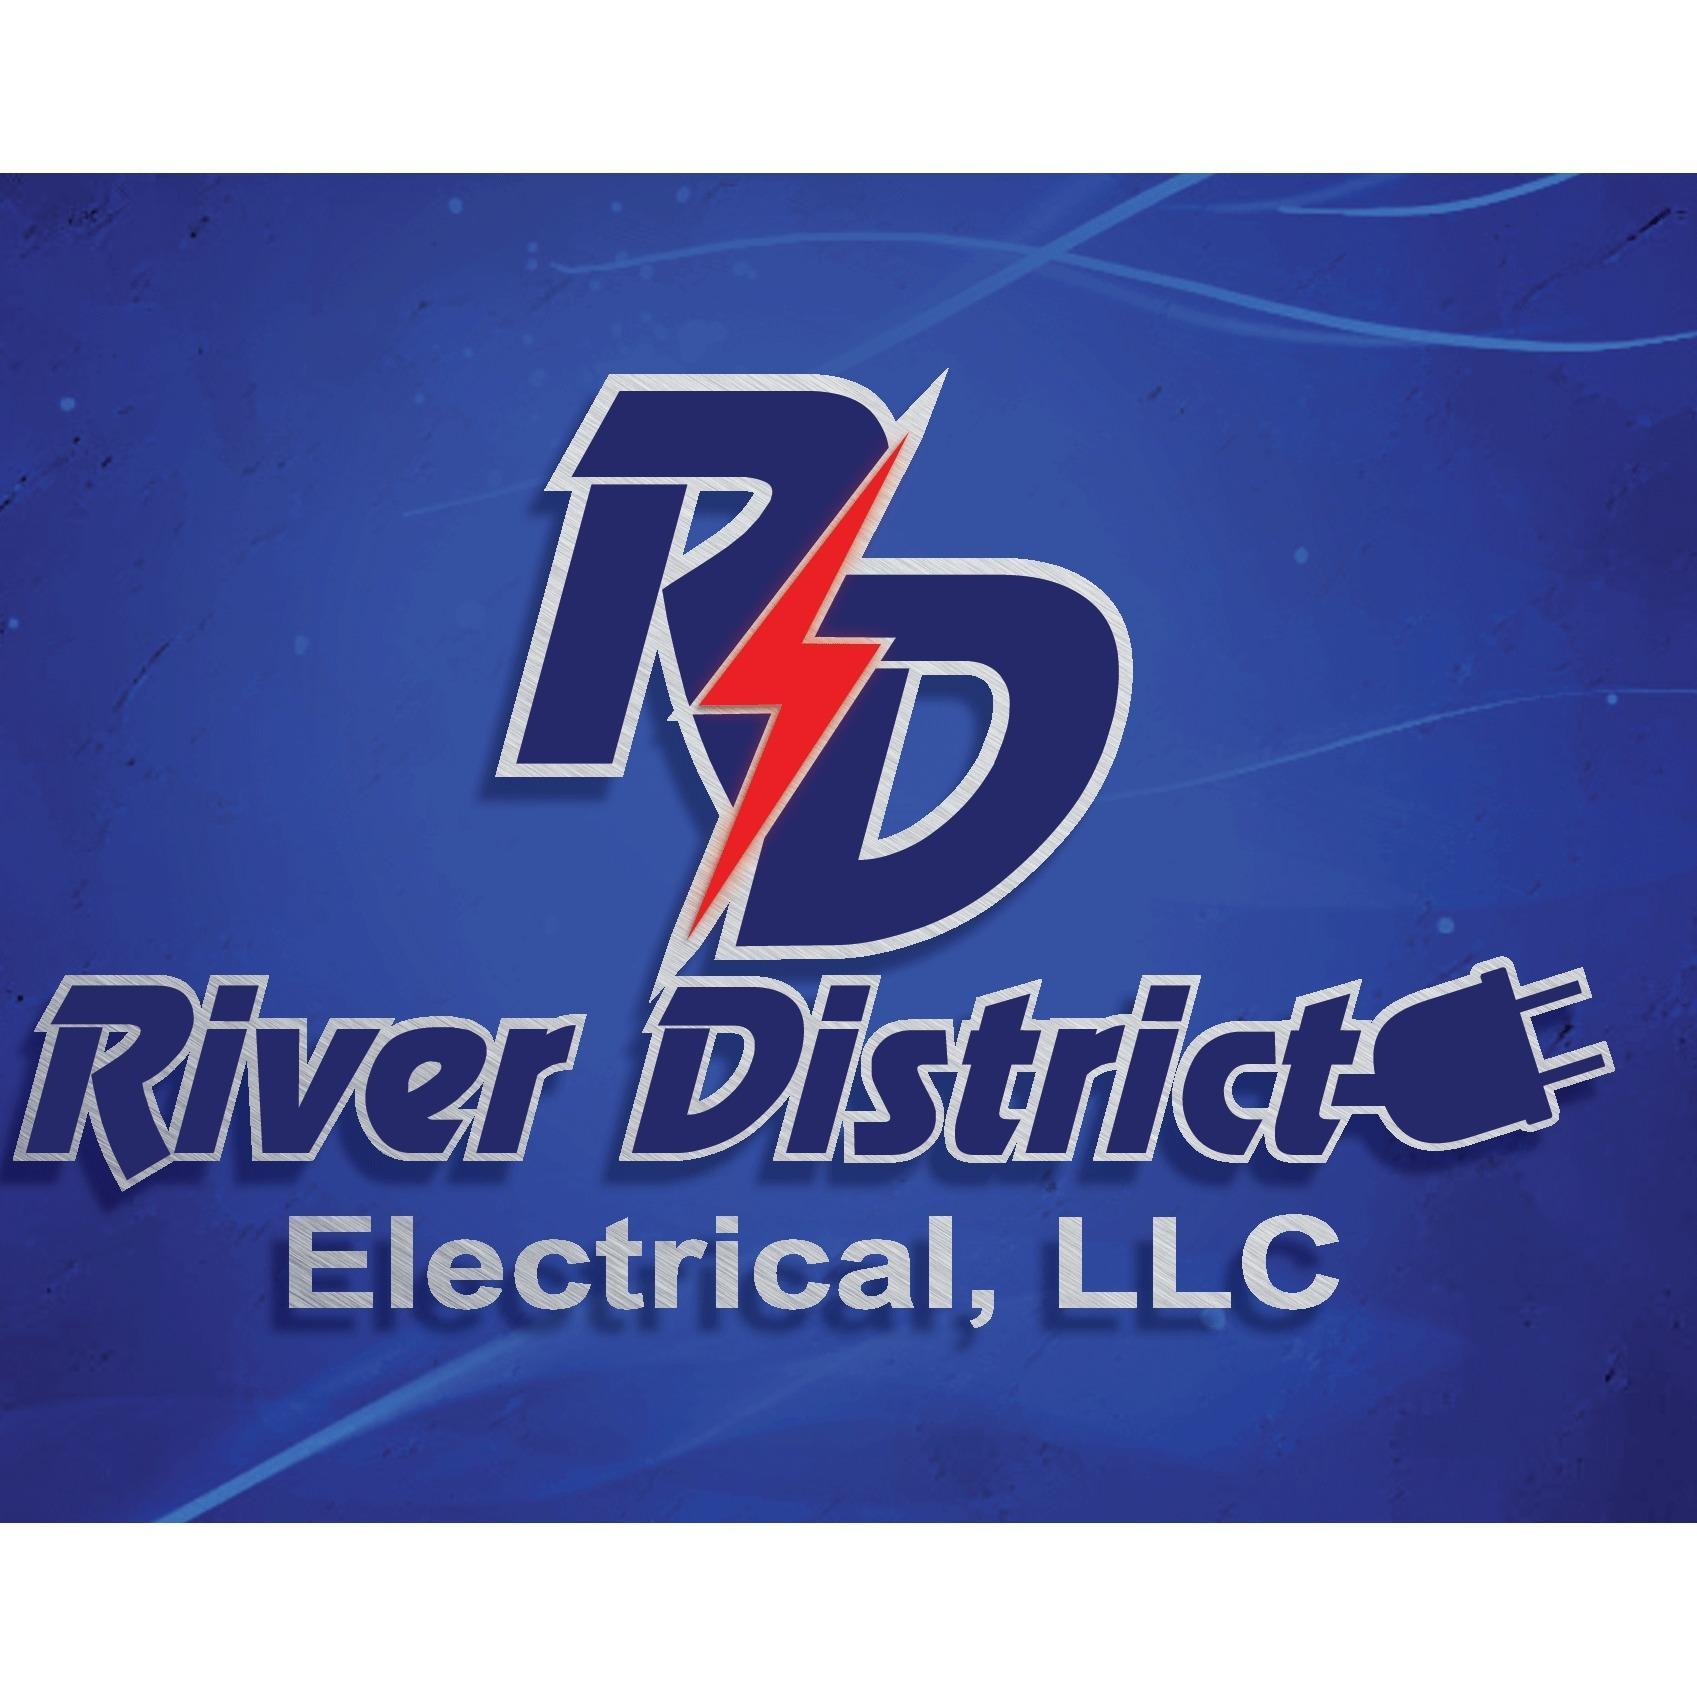 River District Electrical LLC